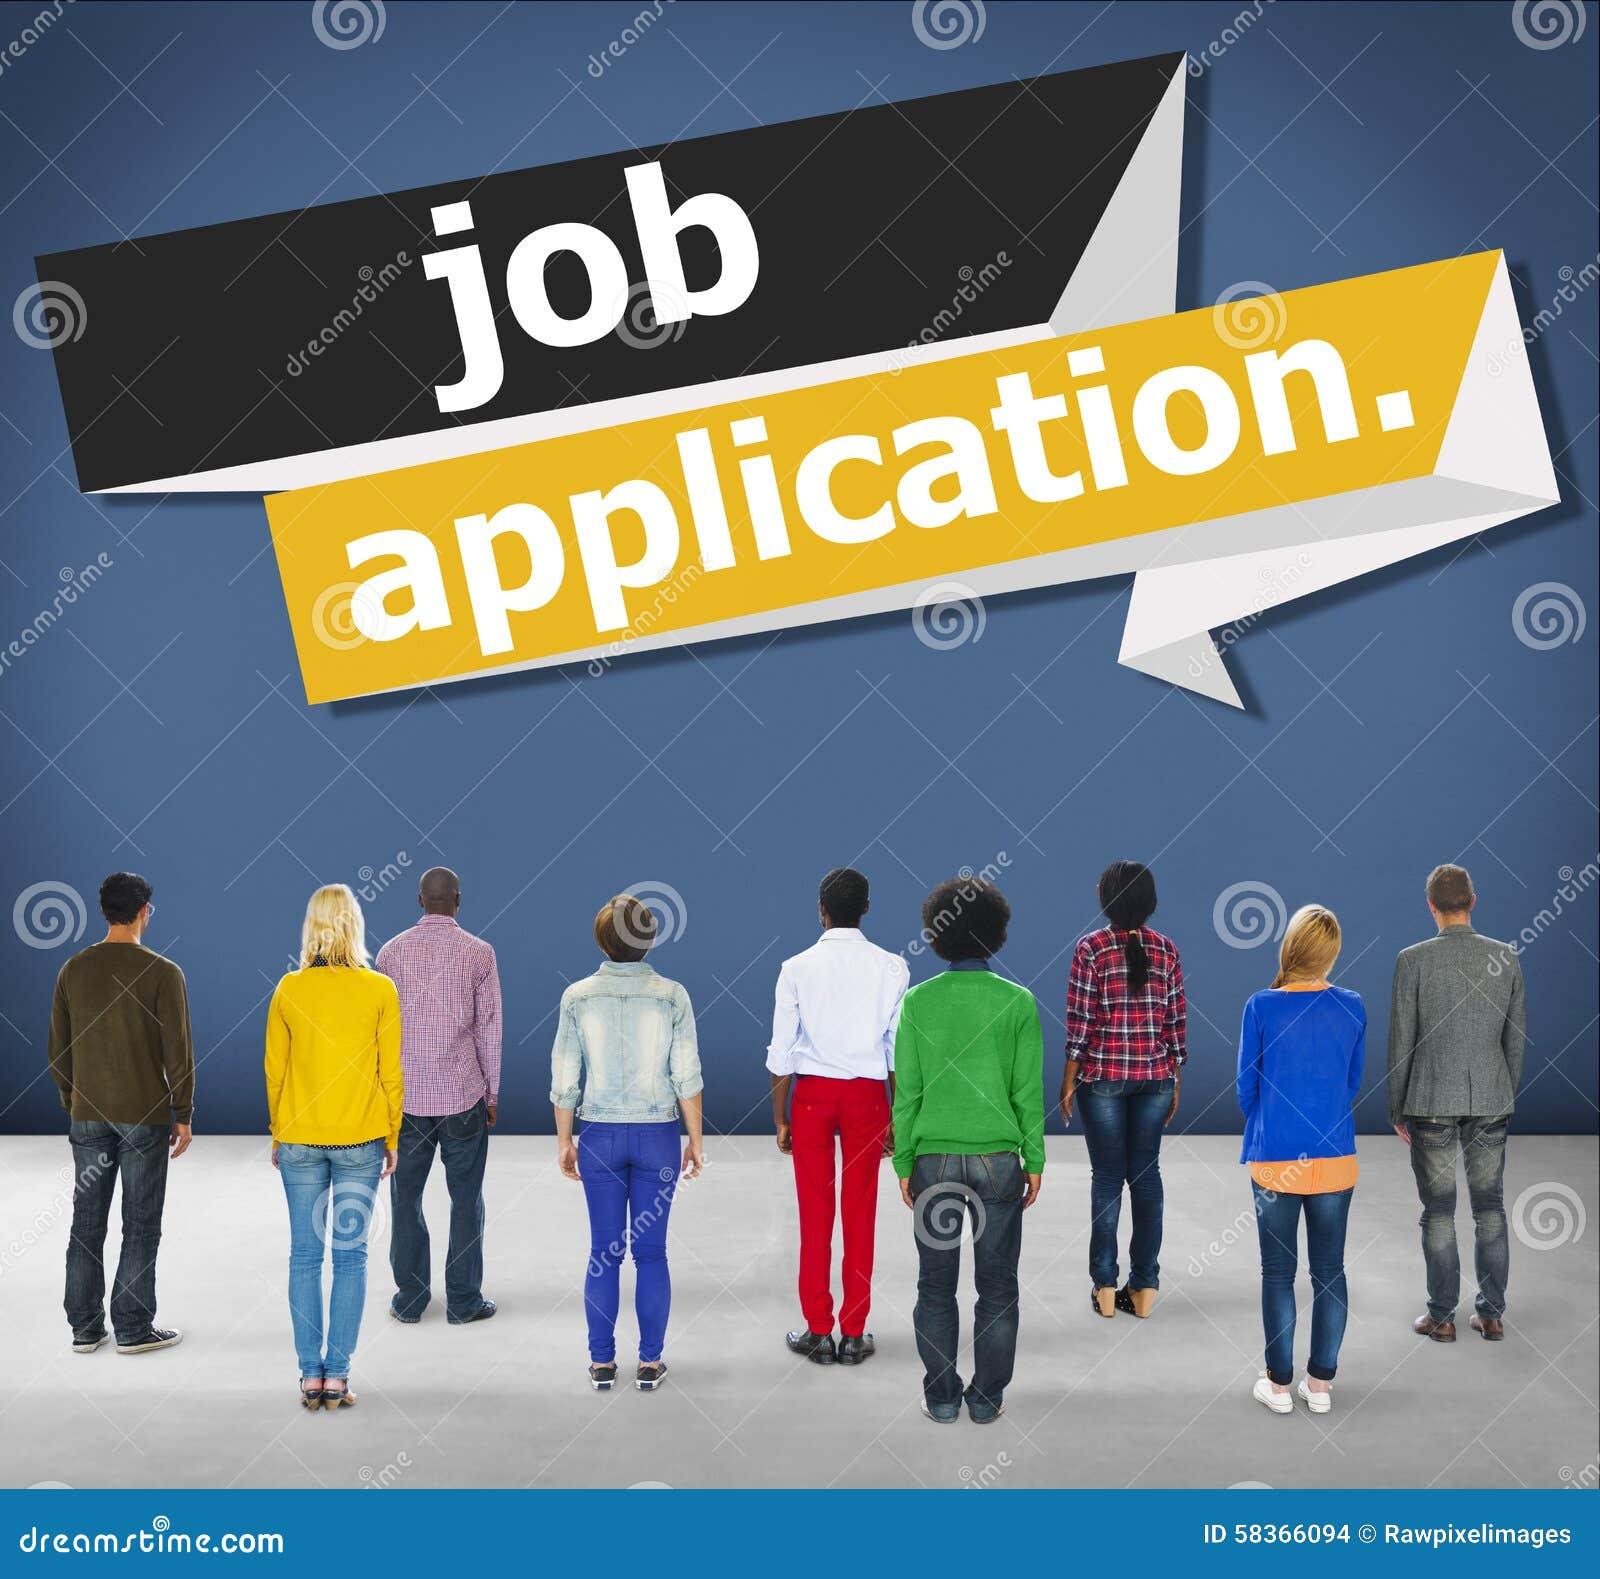 Job Application Applying Recruitment Occupation-Carrièreconcept